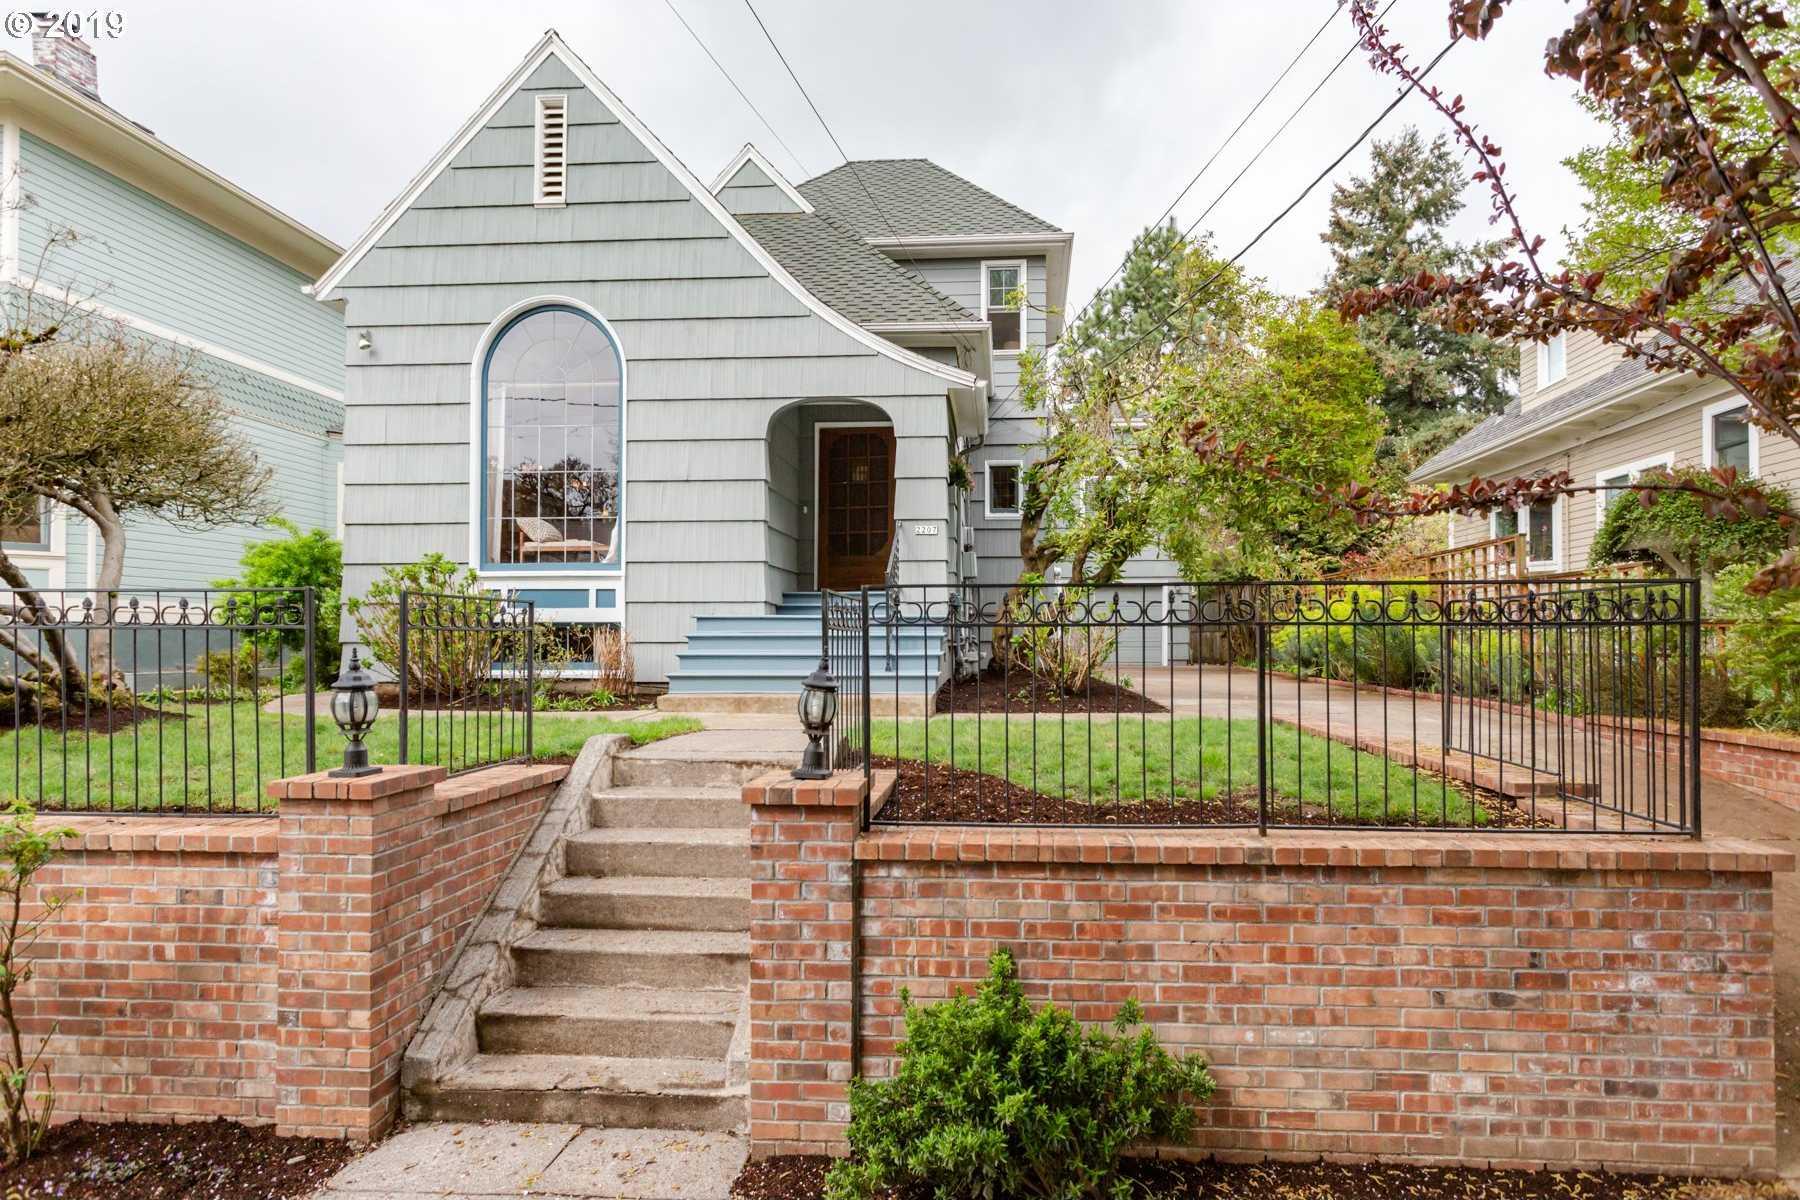 $964,900 - 5Br/5Ba -  for Sale in Irvington, Portland